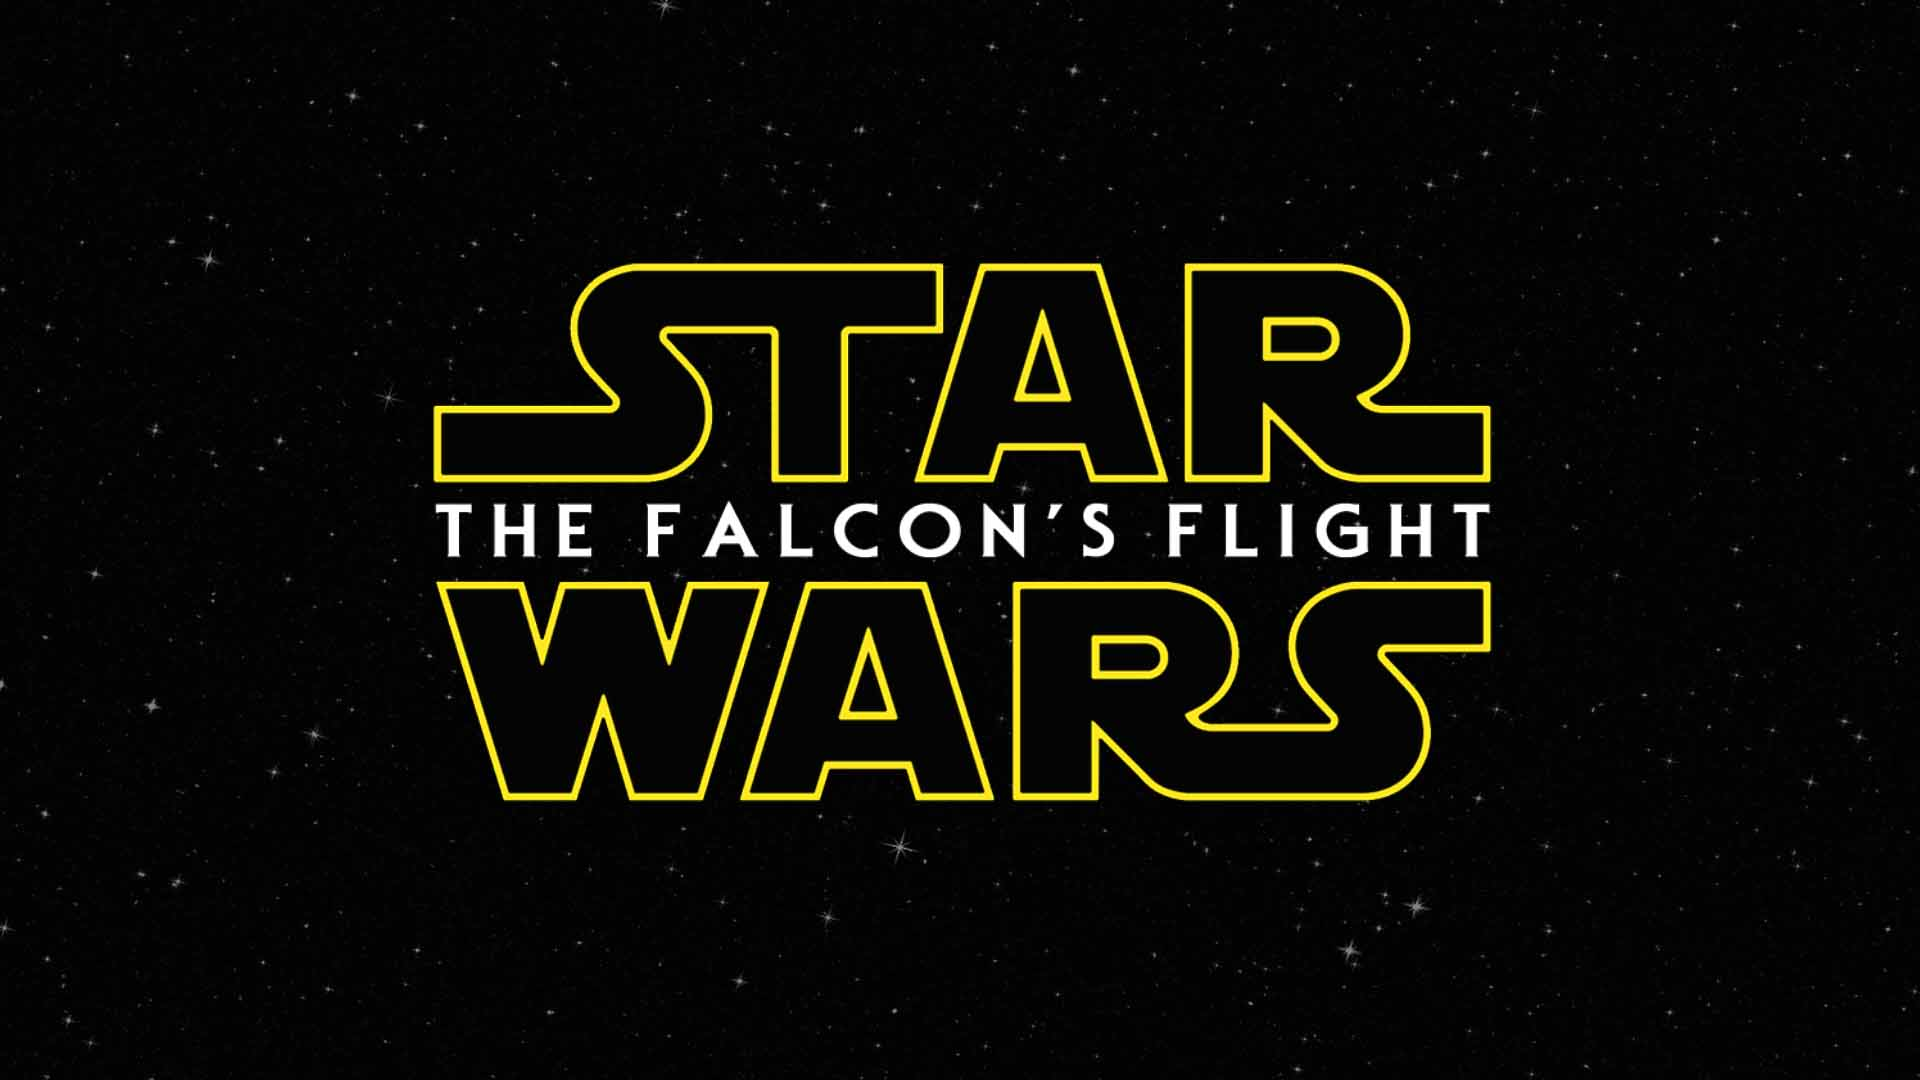 STAR WARS THE FALCON'S FLIGHT